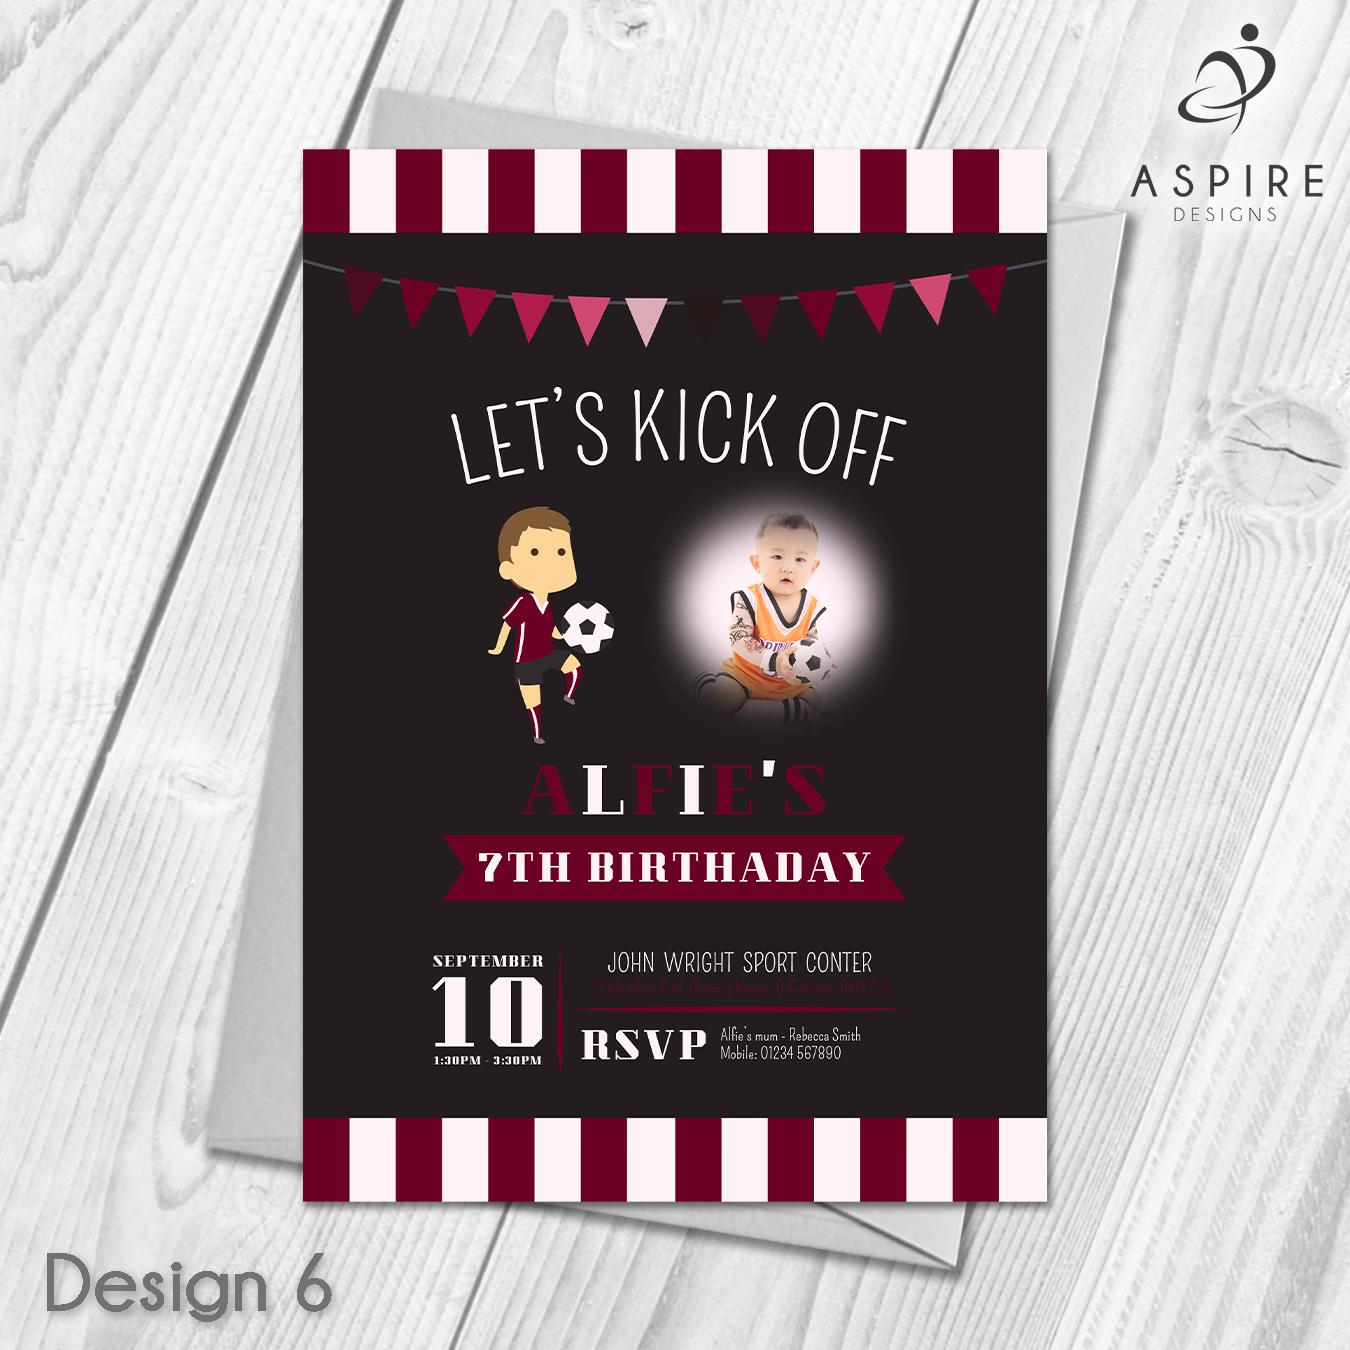 Personalised Children\'s Football Birthday Party Invitations & Envelopes